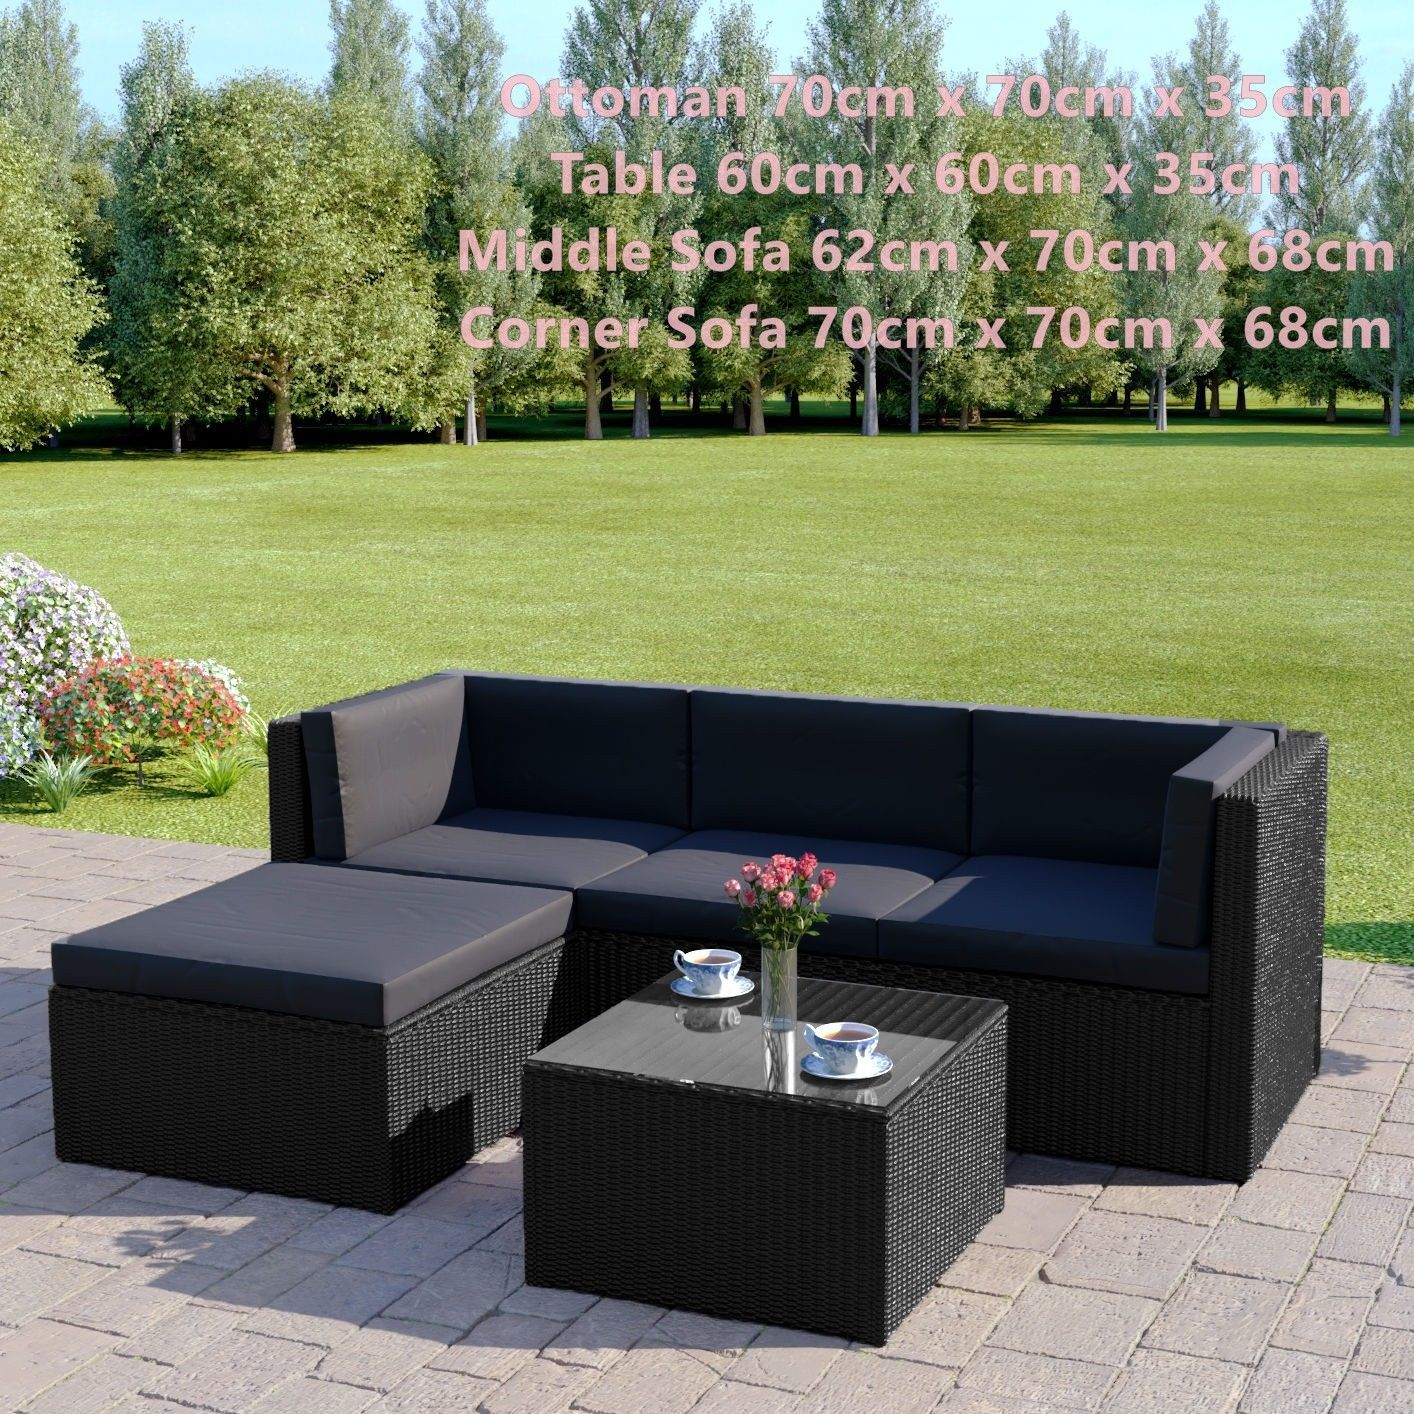 Black Rattan Sofa & Stool Set Modular Outdoor Garden Furniture Dark Cushions New